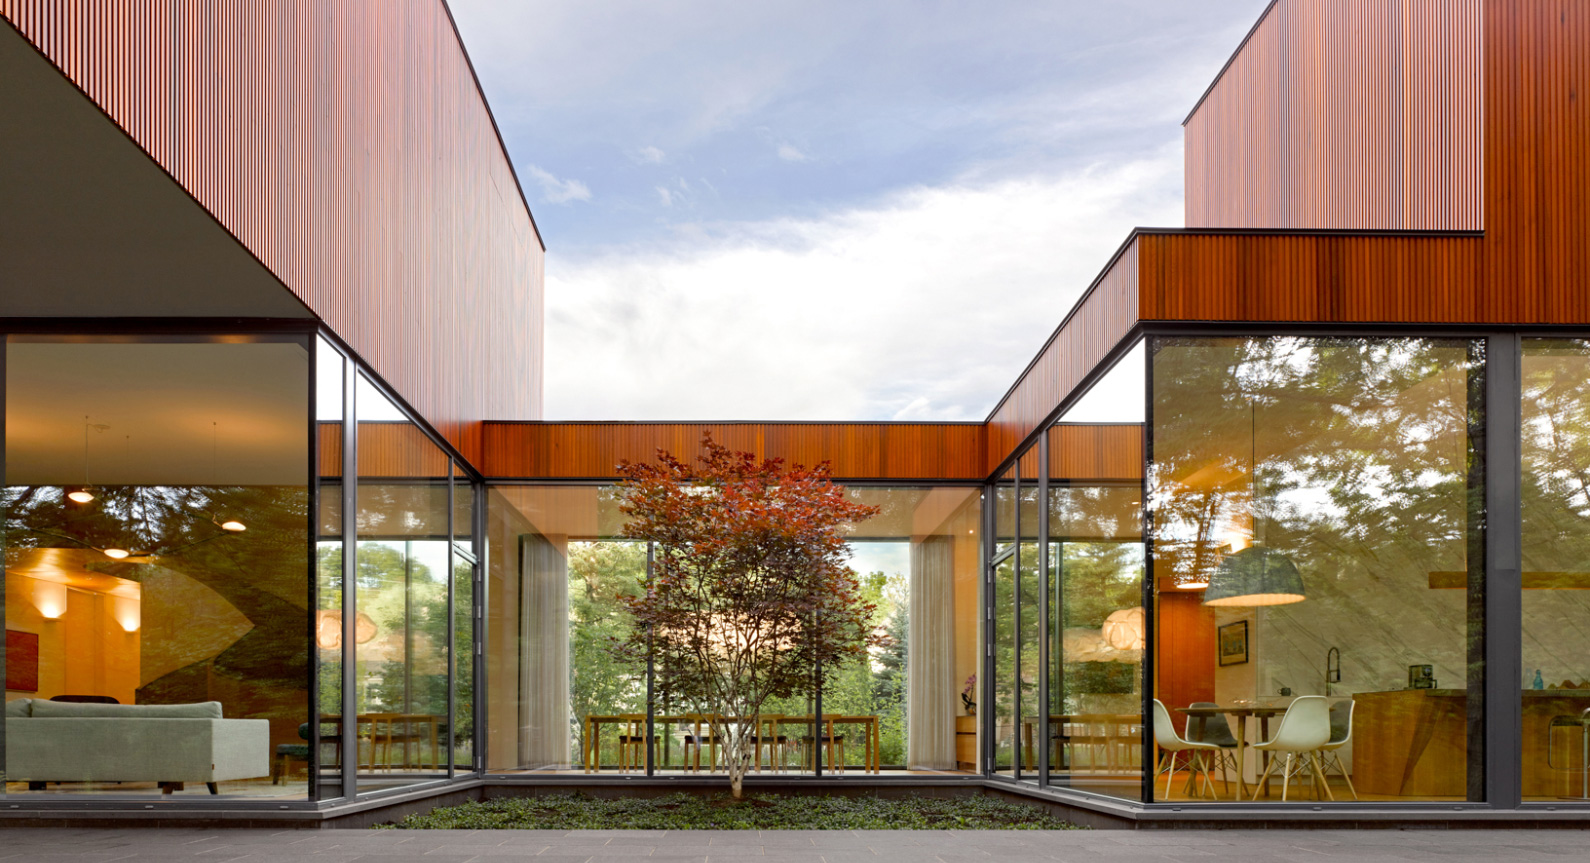 The Ancaster Creek House Rethinks Suburban Living